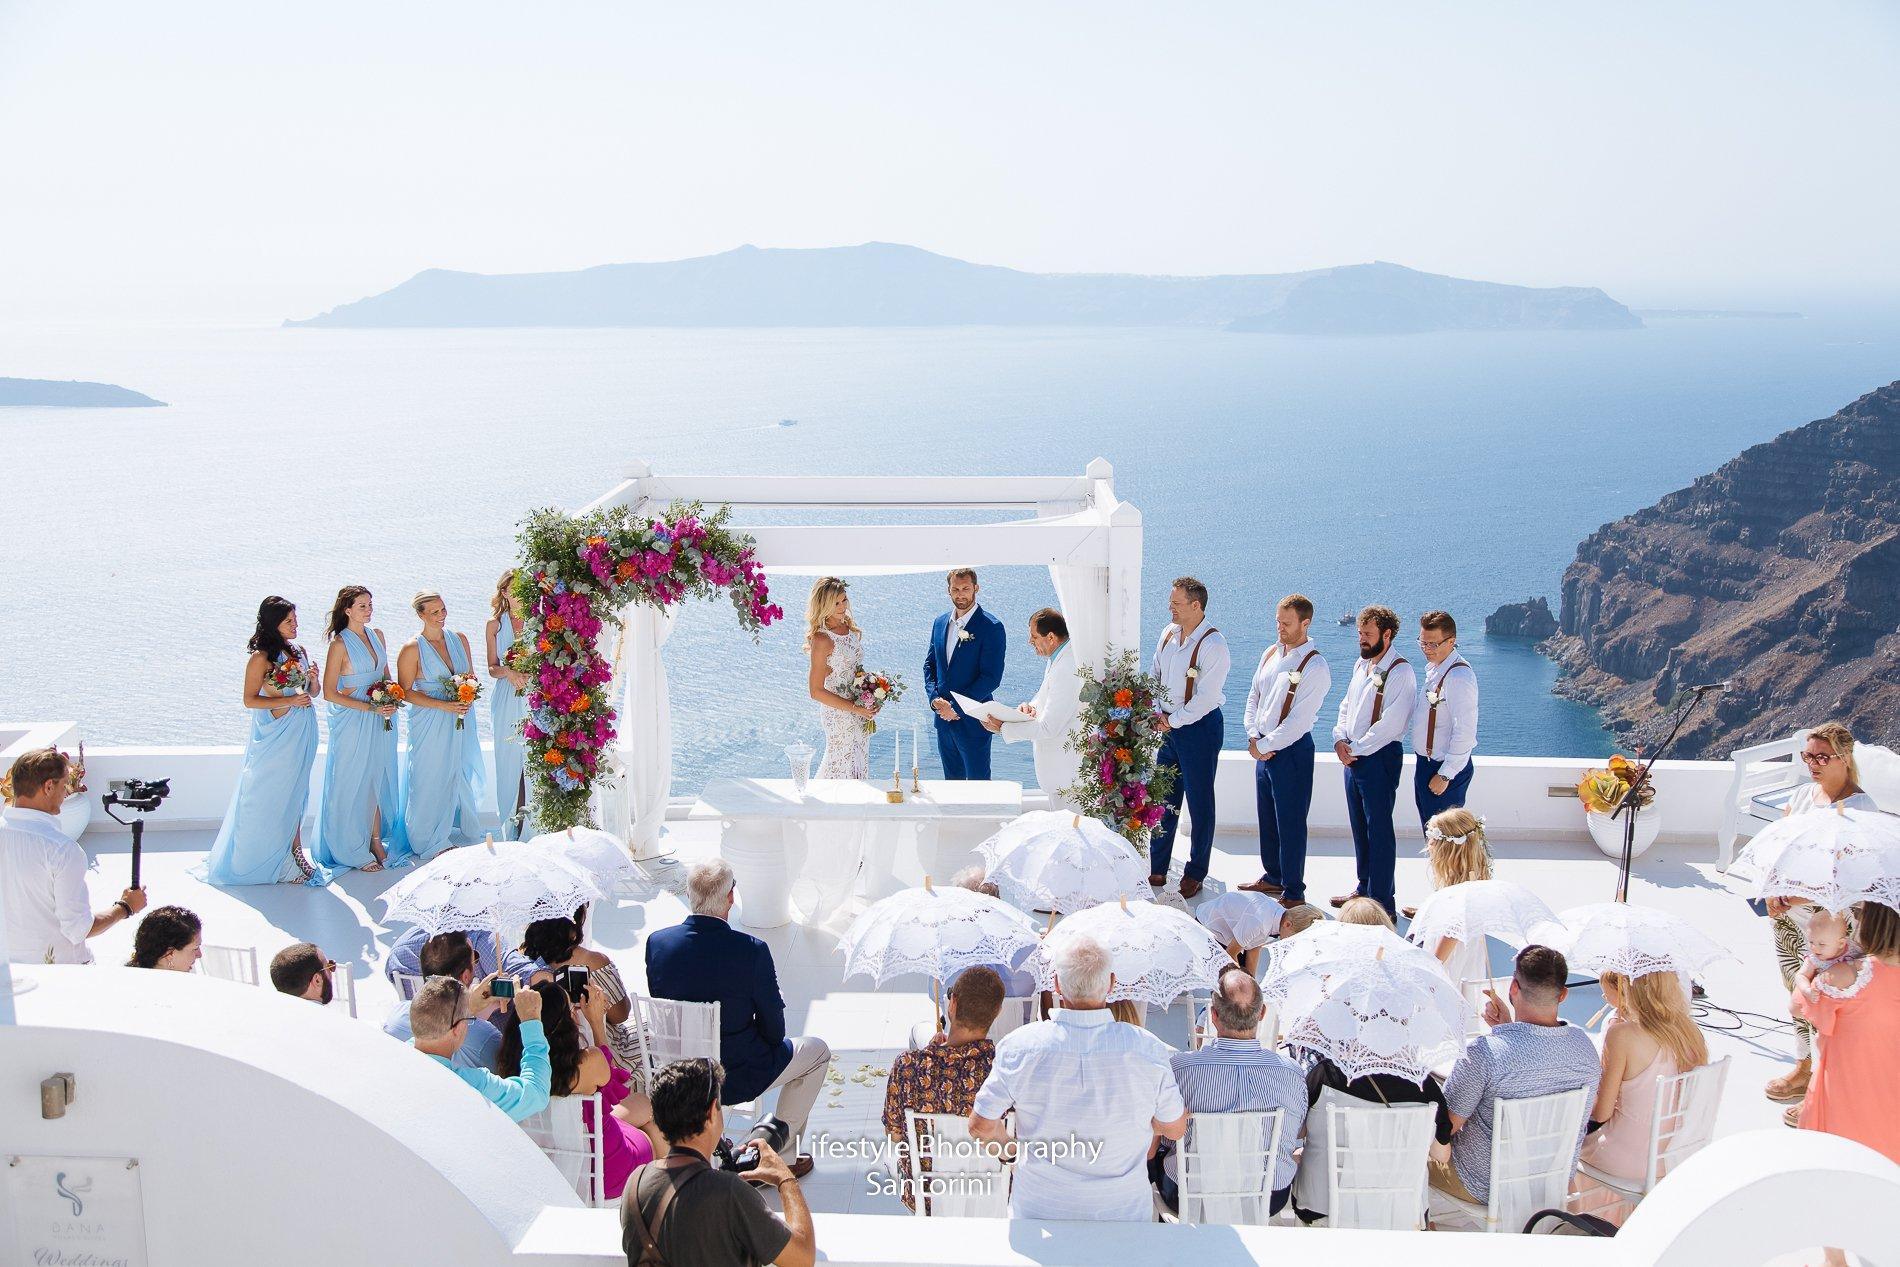 SantoriniMyWedding | dana villas wedding